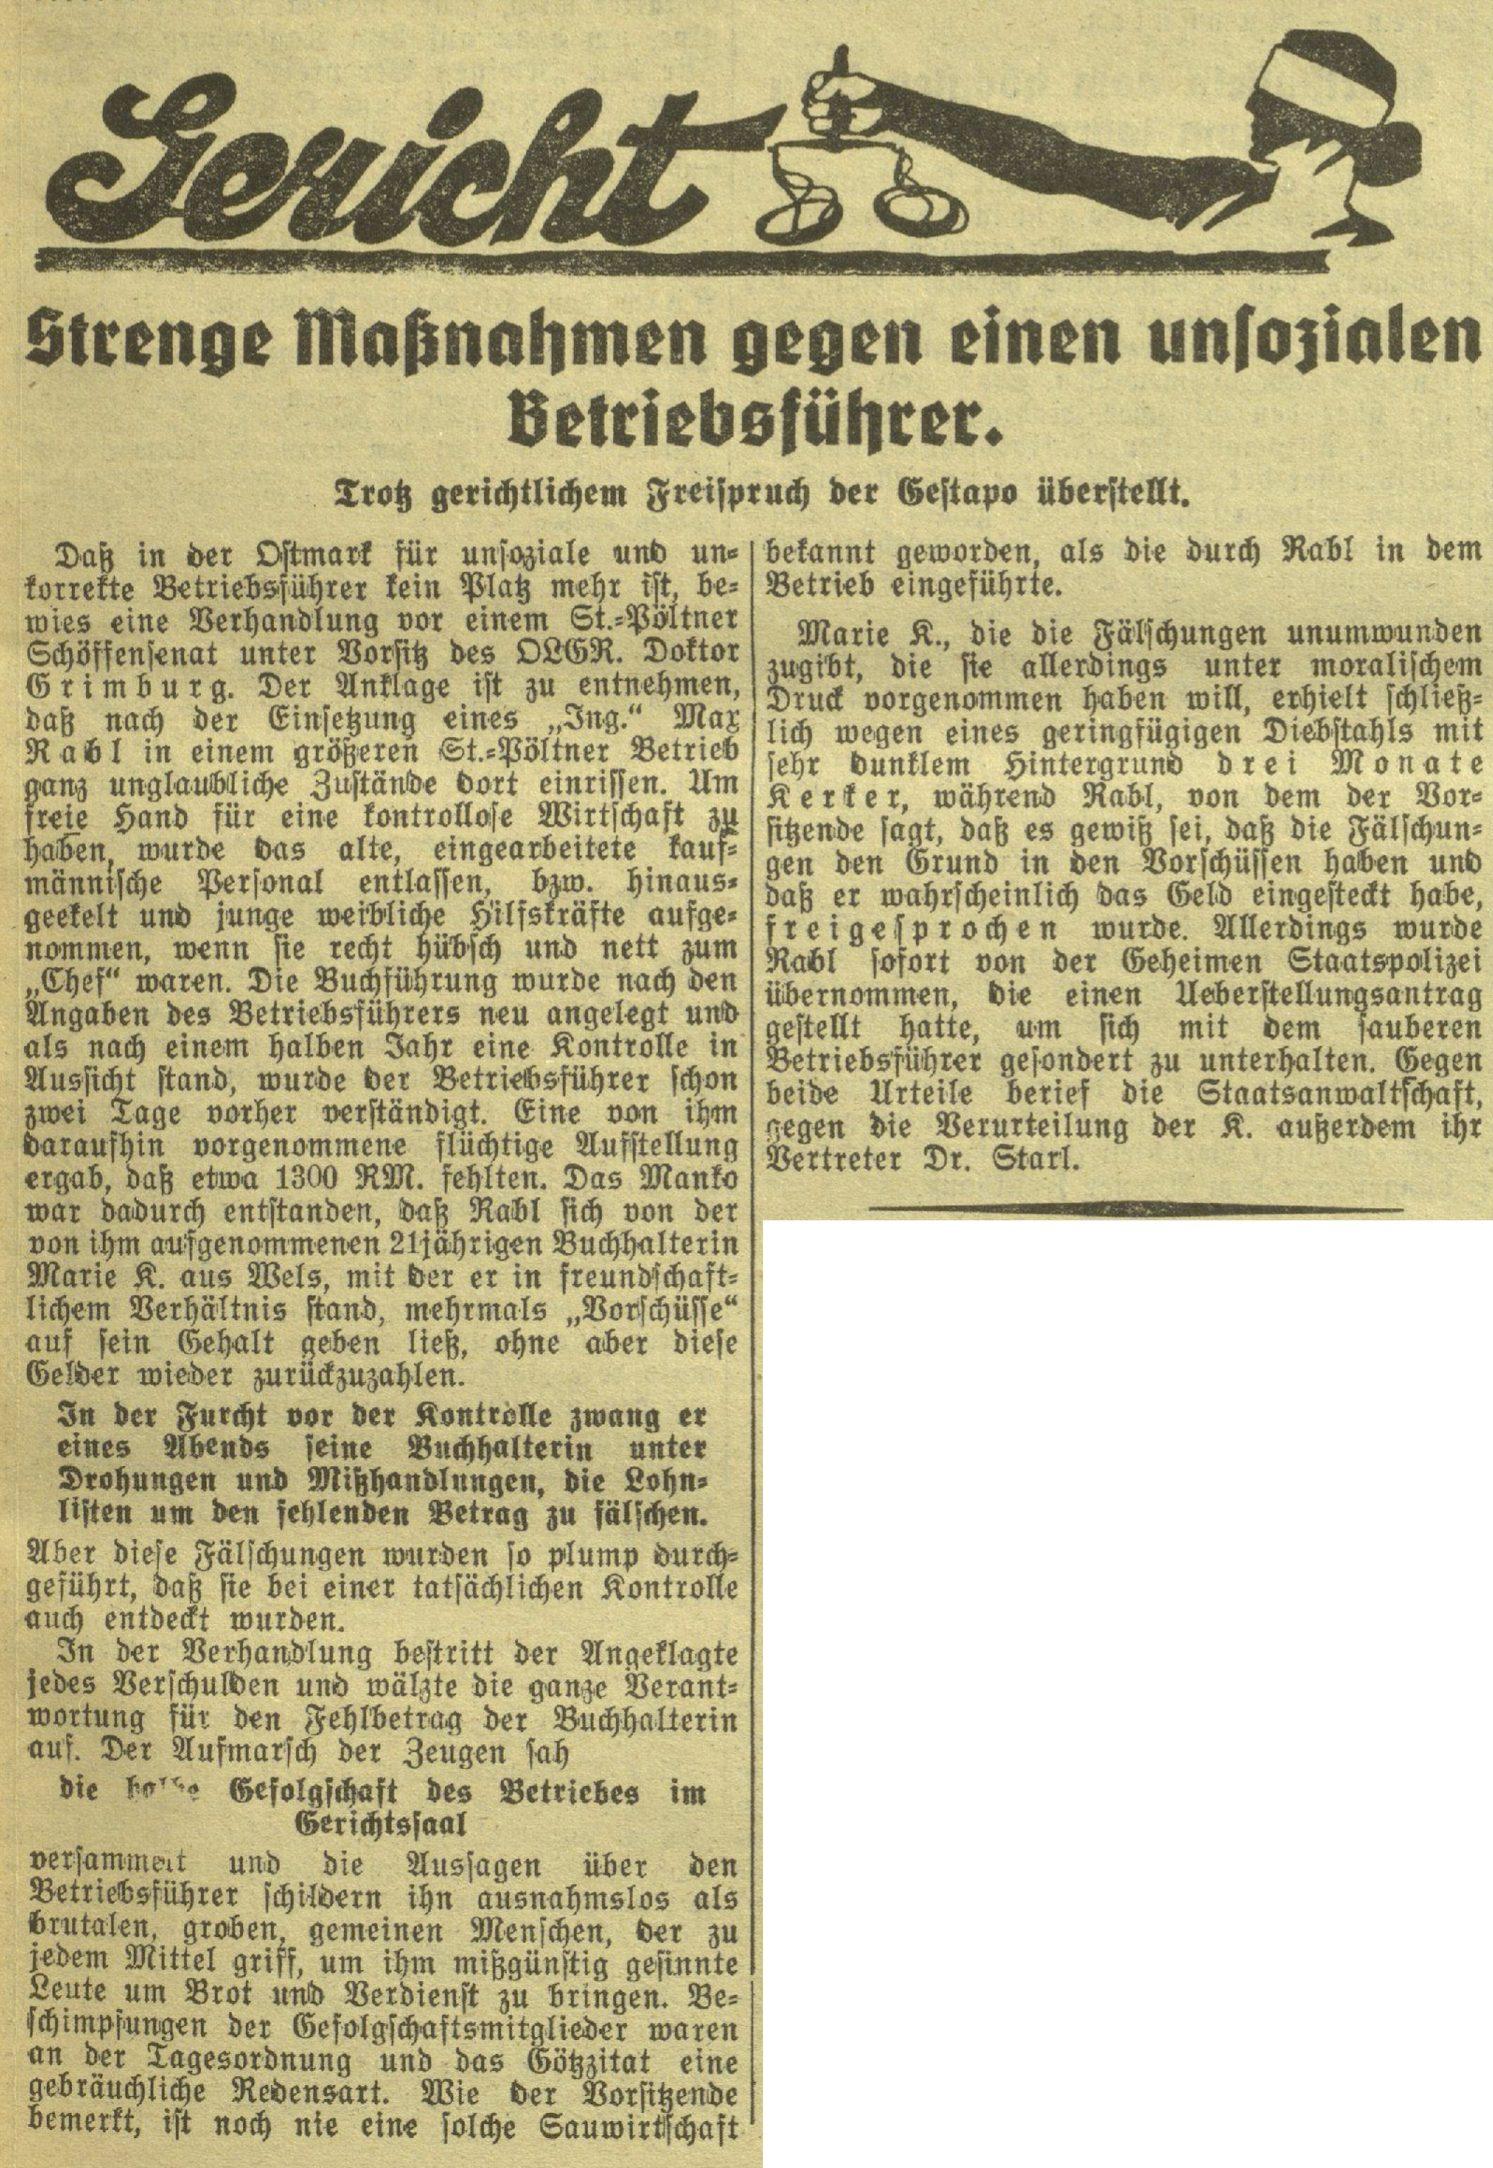 Das kleine Volksblatt 7.7.1939, S. 11 (http://anno.onb.ac.at/cgi-content/anno?aid=dkv&datum=19390707&query=%22Max+Rabl%22&ref=anno-search&seite=11)